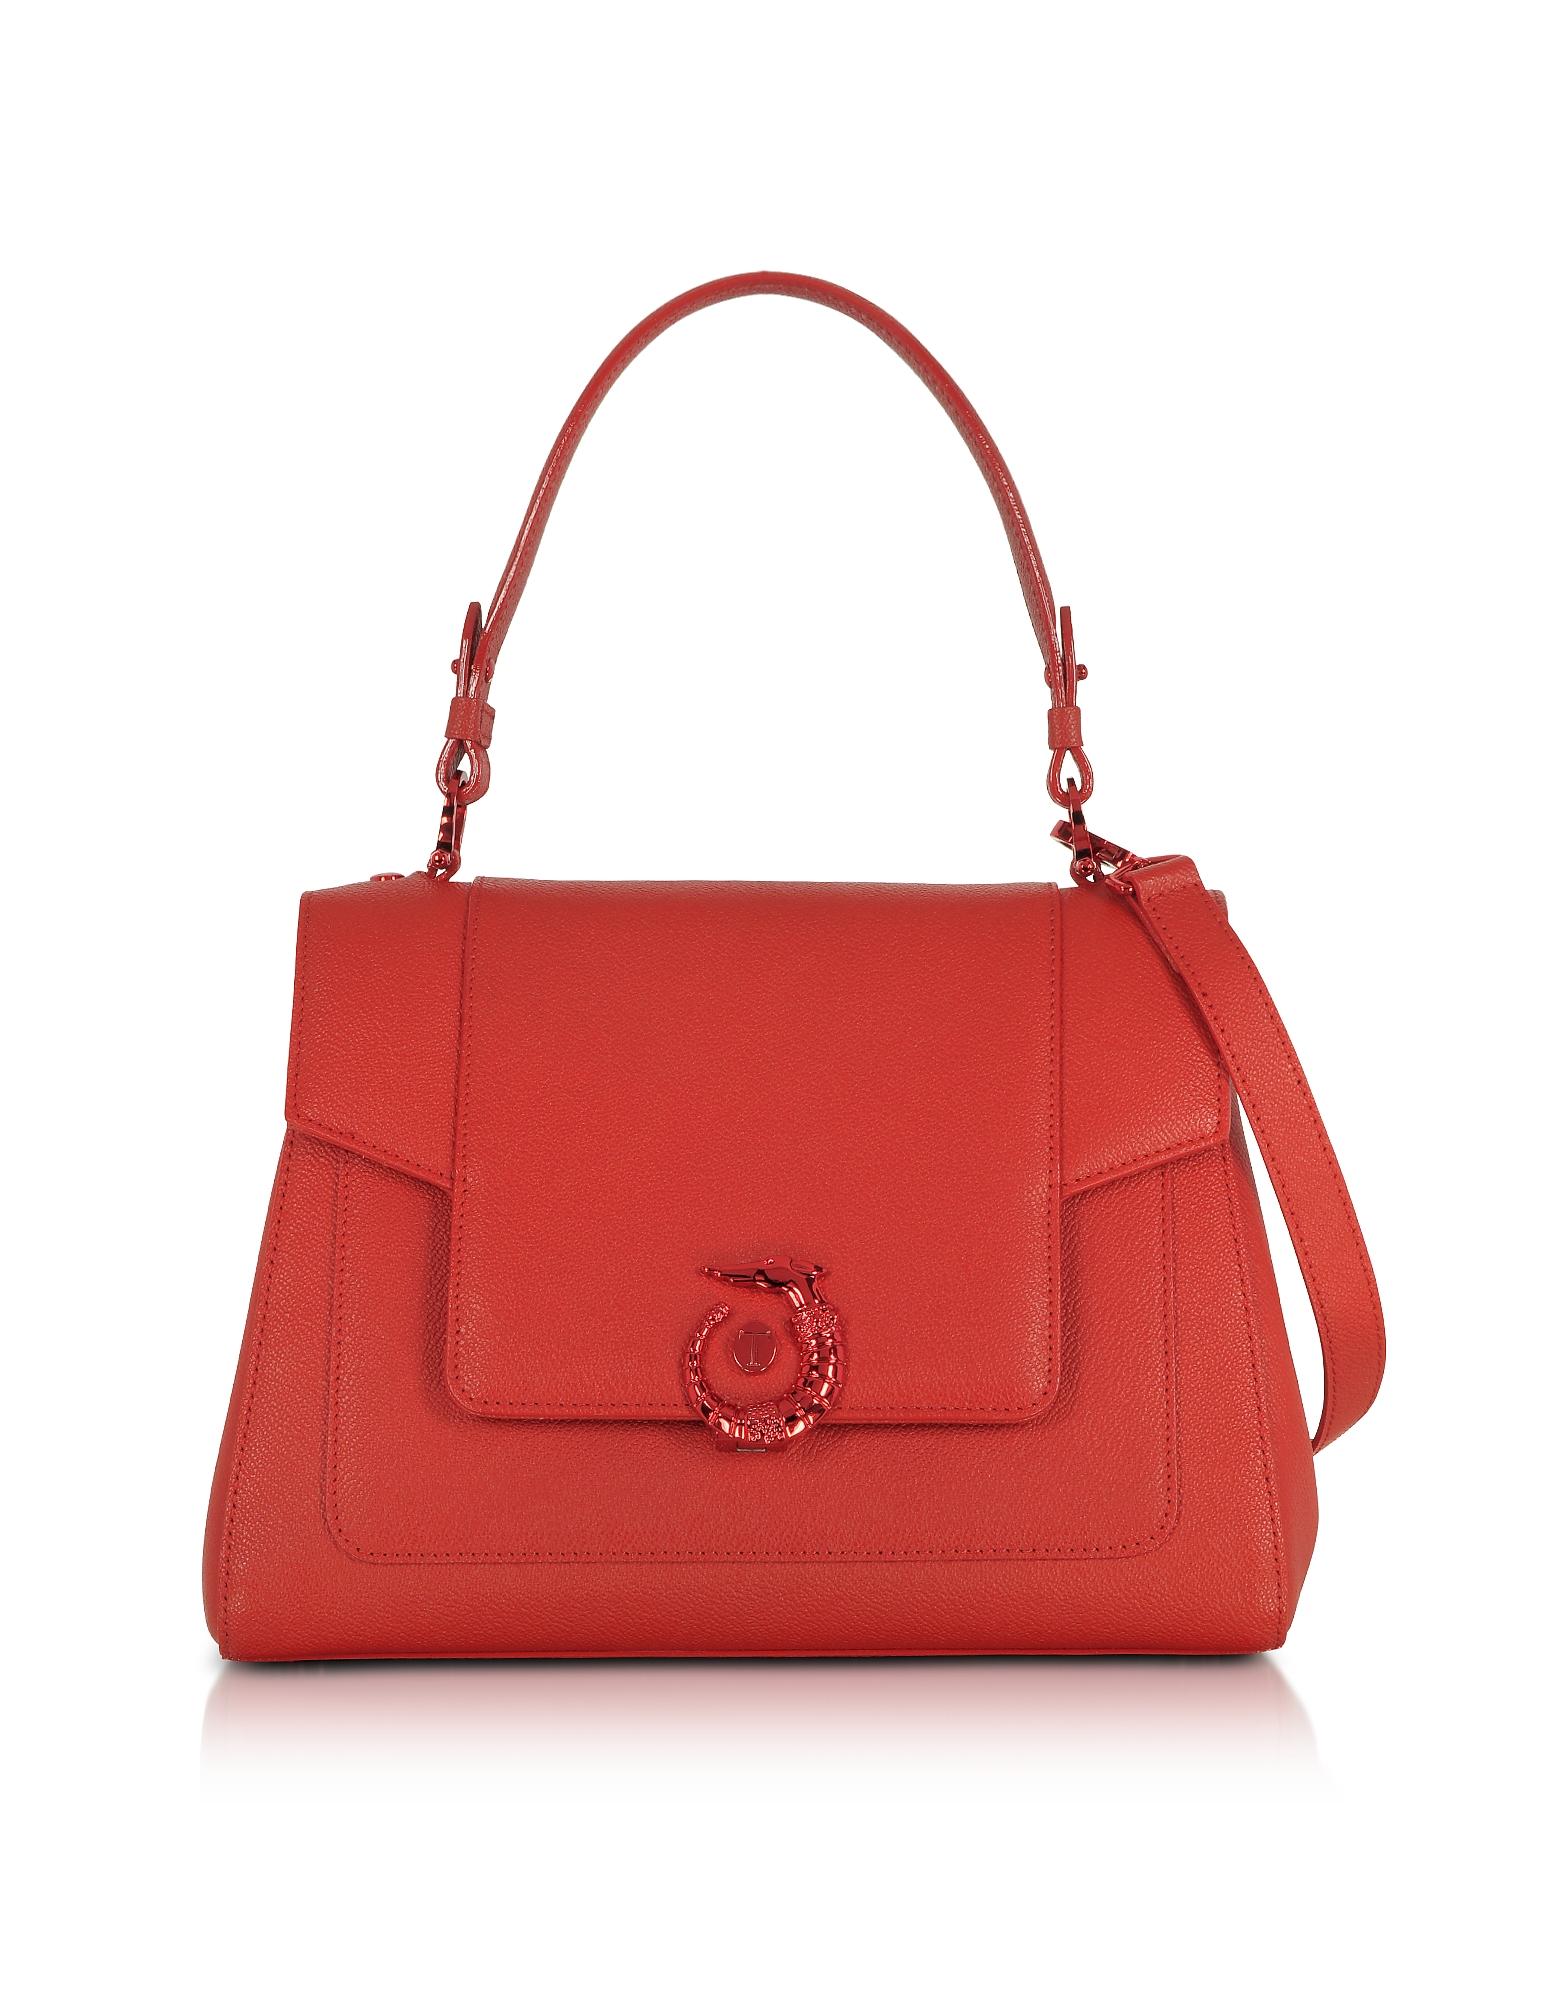 Trussardi Handbags, Lovy Red Crepe Leather Satchel Bag